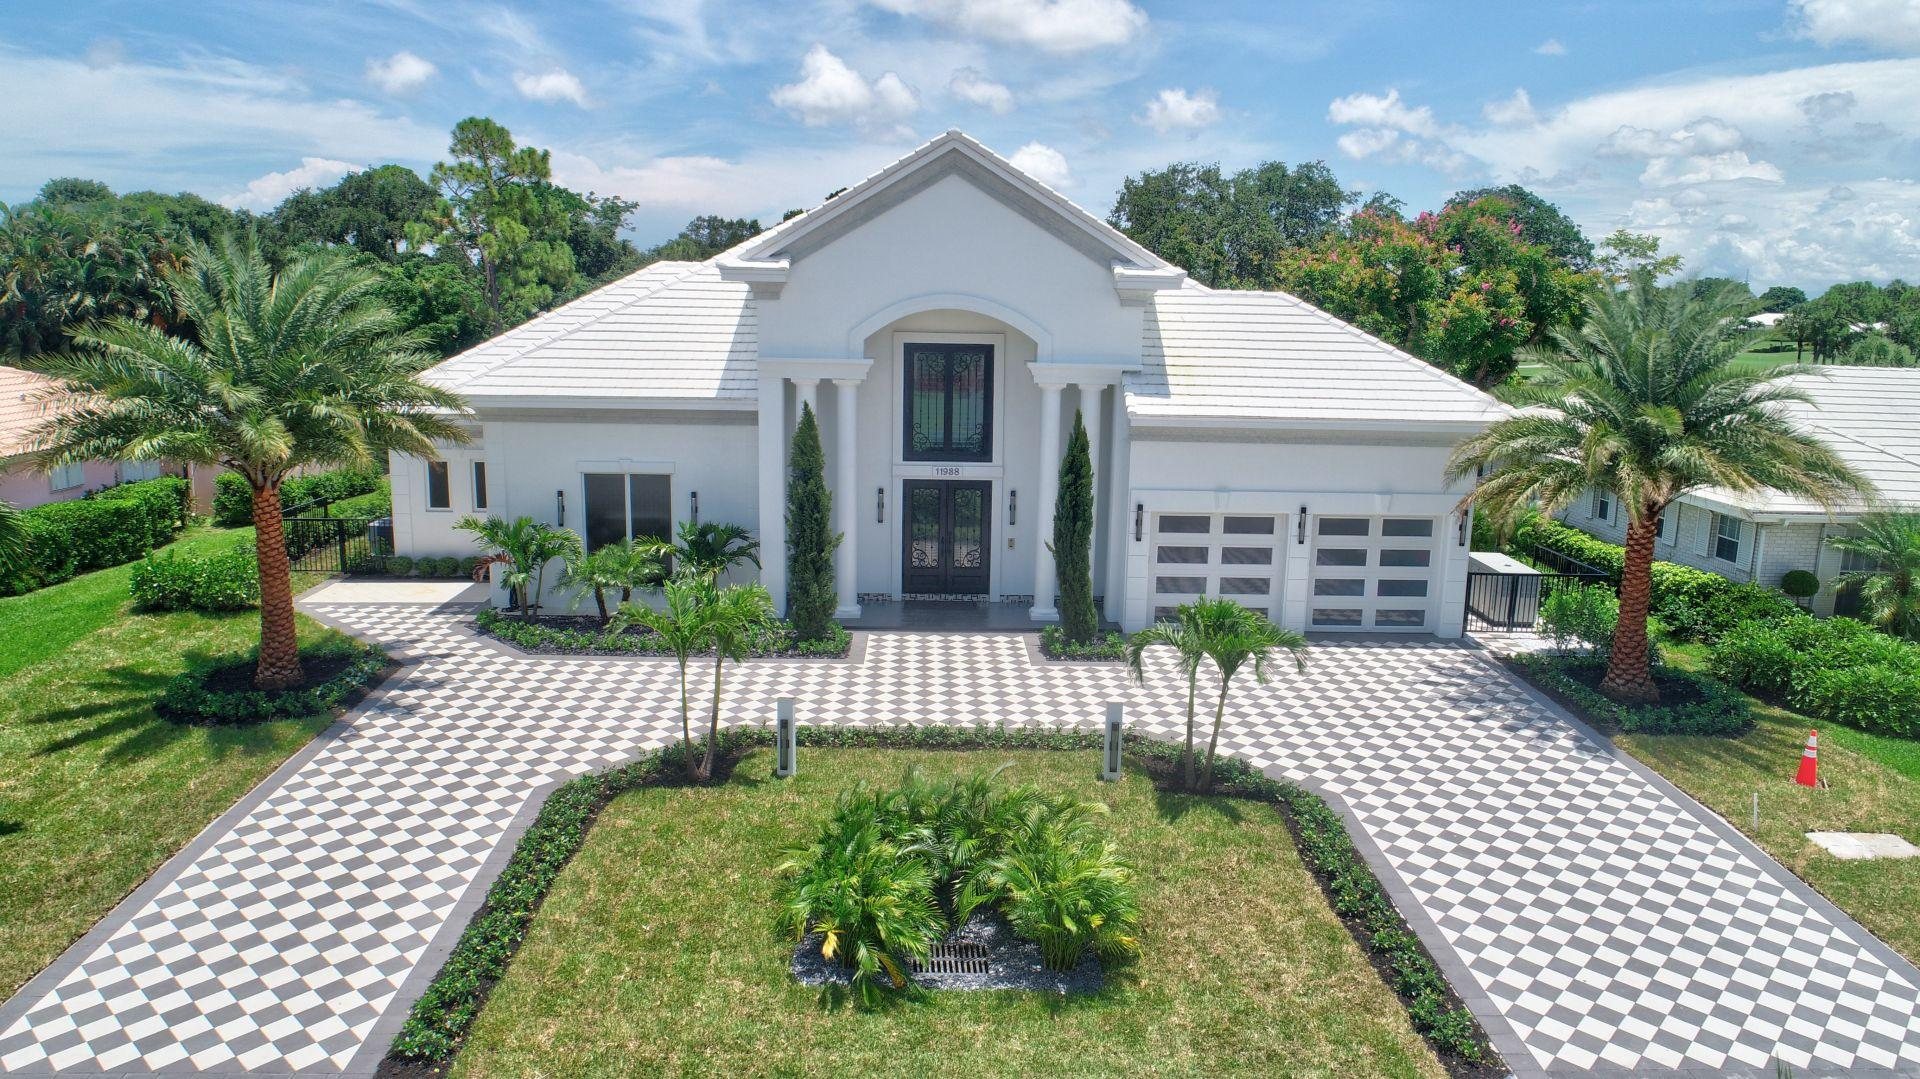 11938 N Lake Drive Boynton Beach, FL 33436